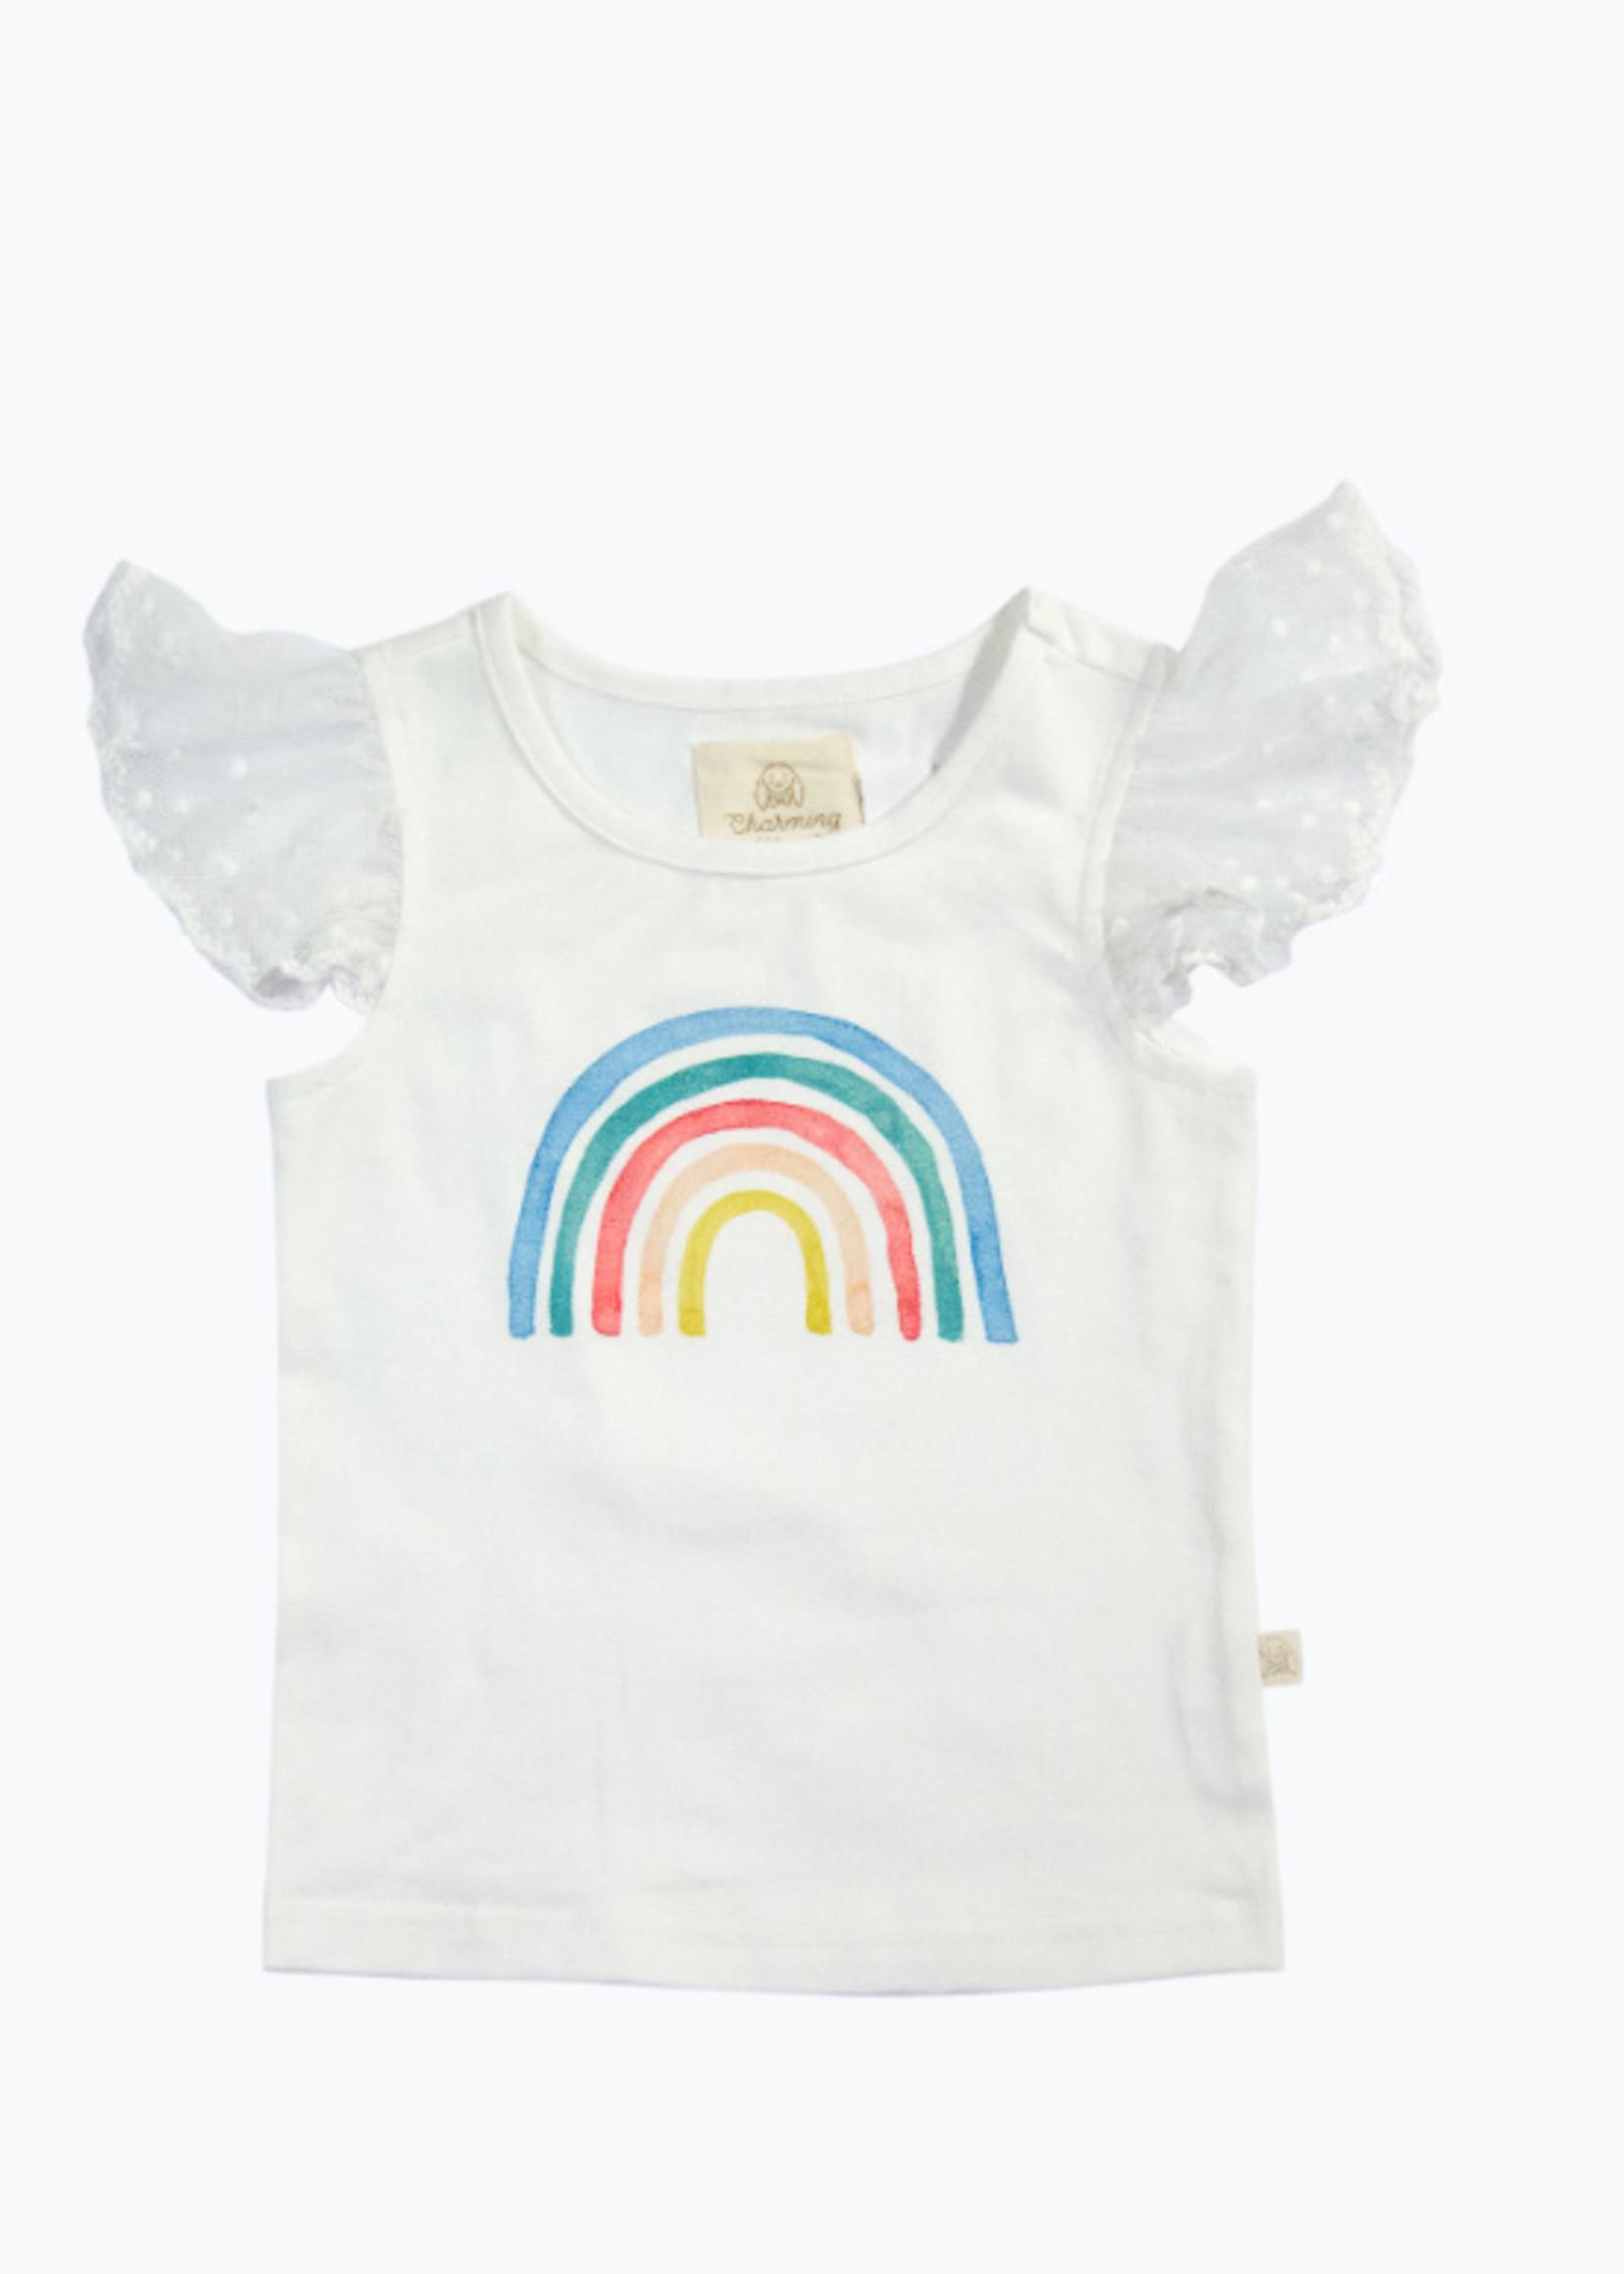 charming mary Tally Tee- Watercolor Rainbow